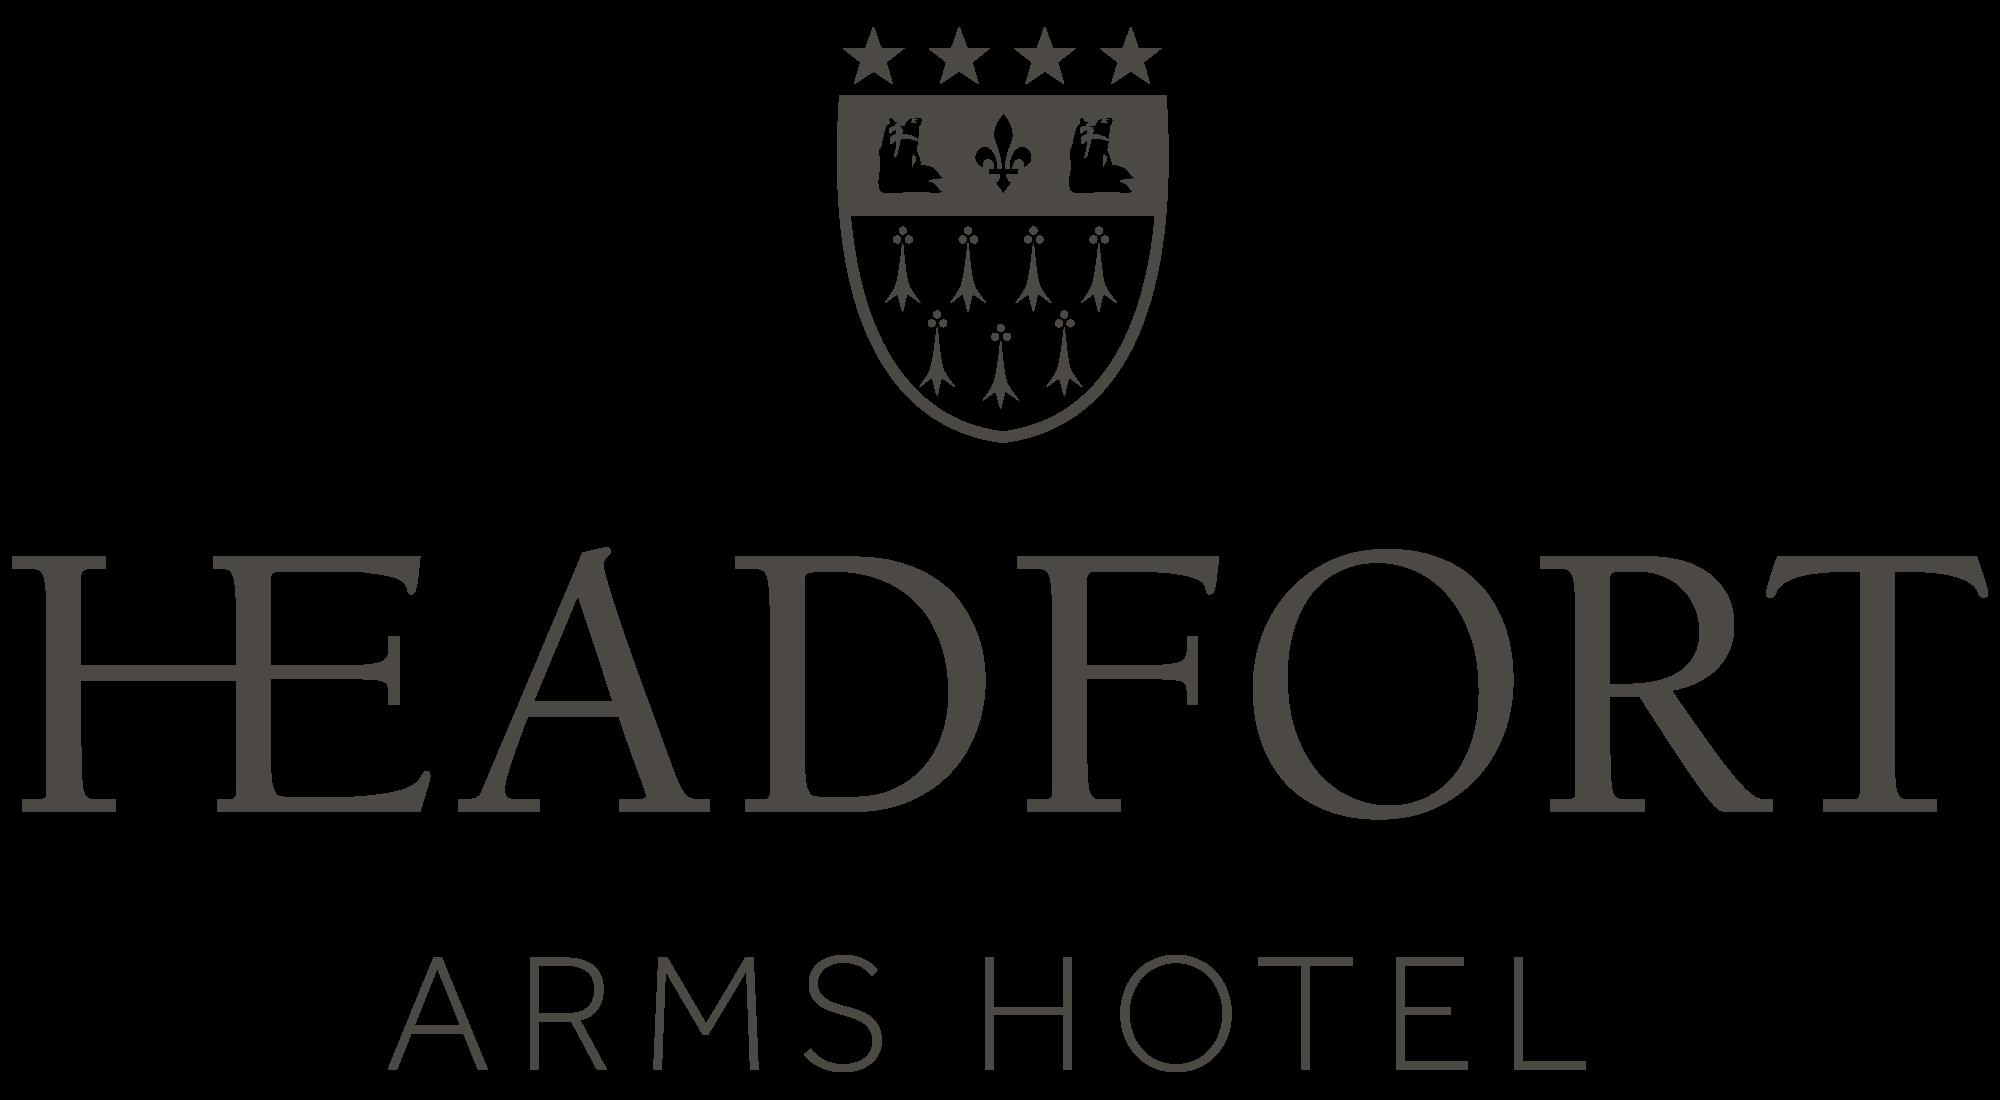 Headfort Arms Hotel